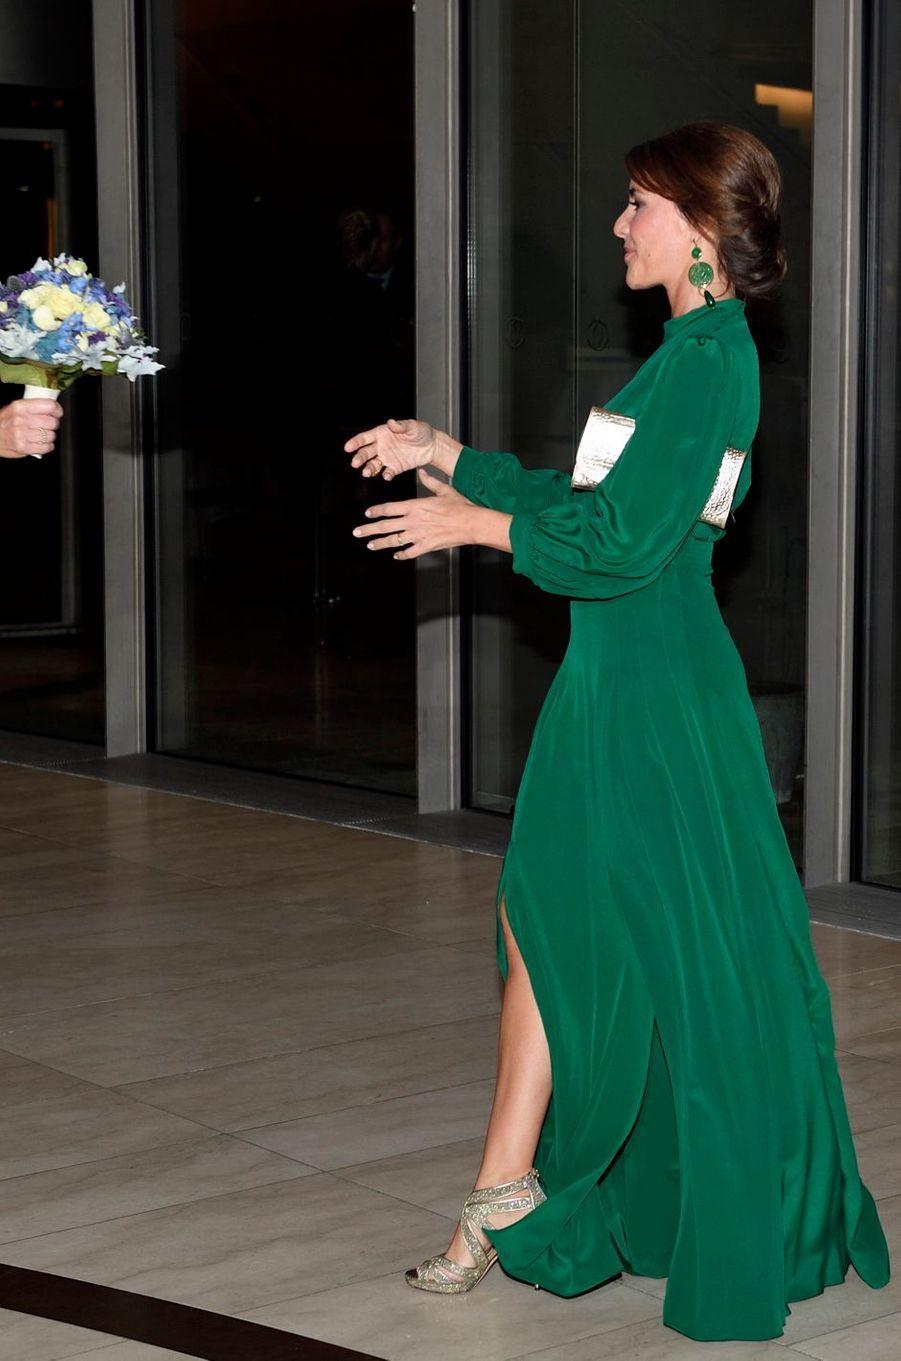 La princesse Marie de Danemark, le 10 octobre 2018